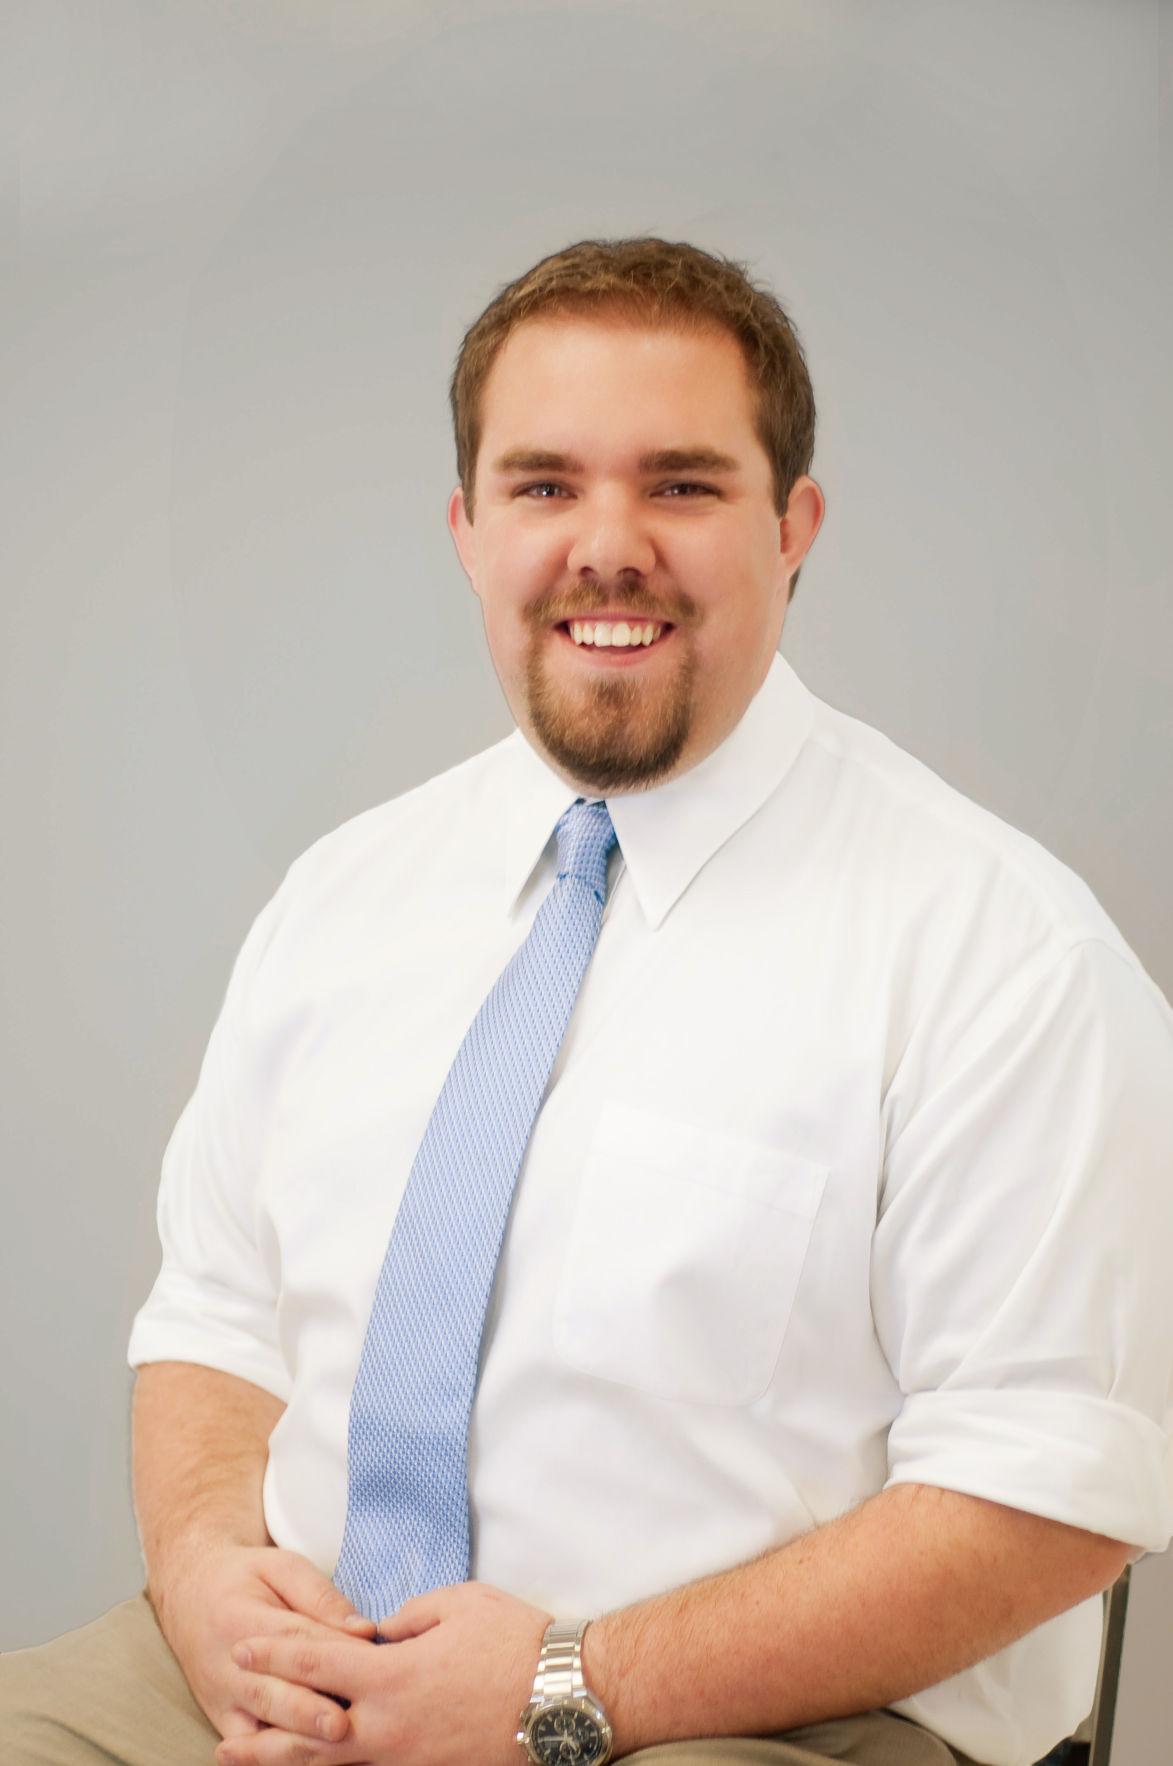 Justin Aufdermauer Executive Director